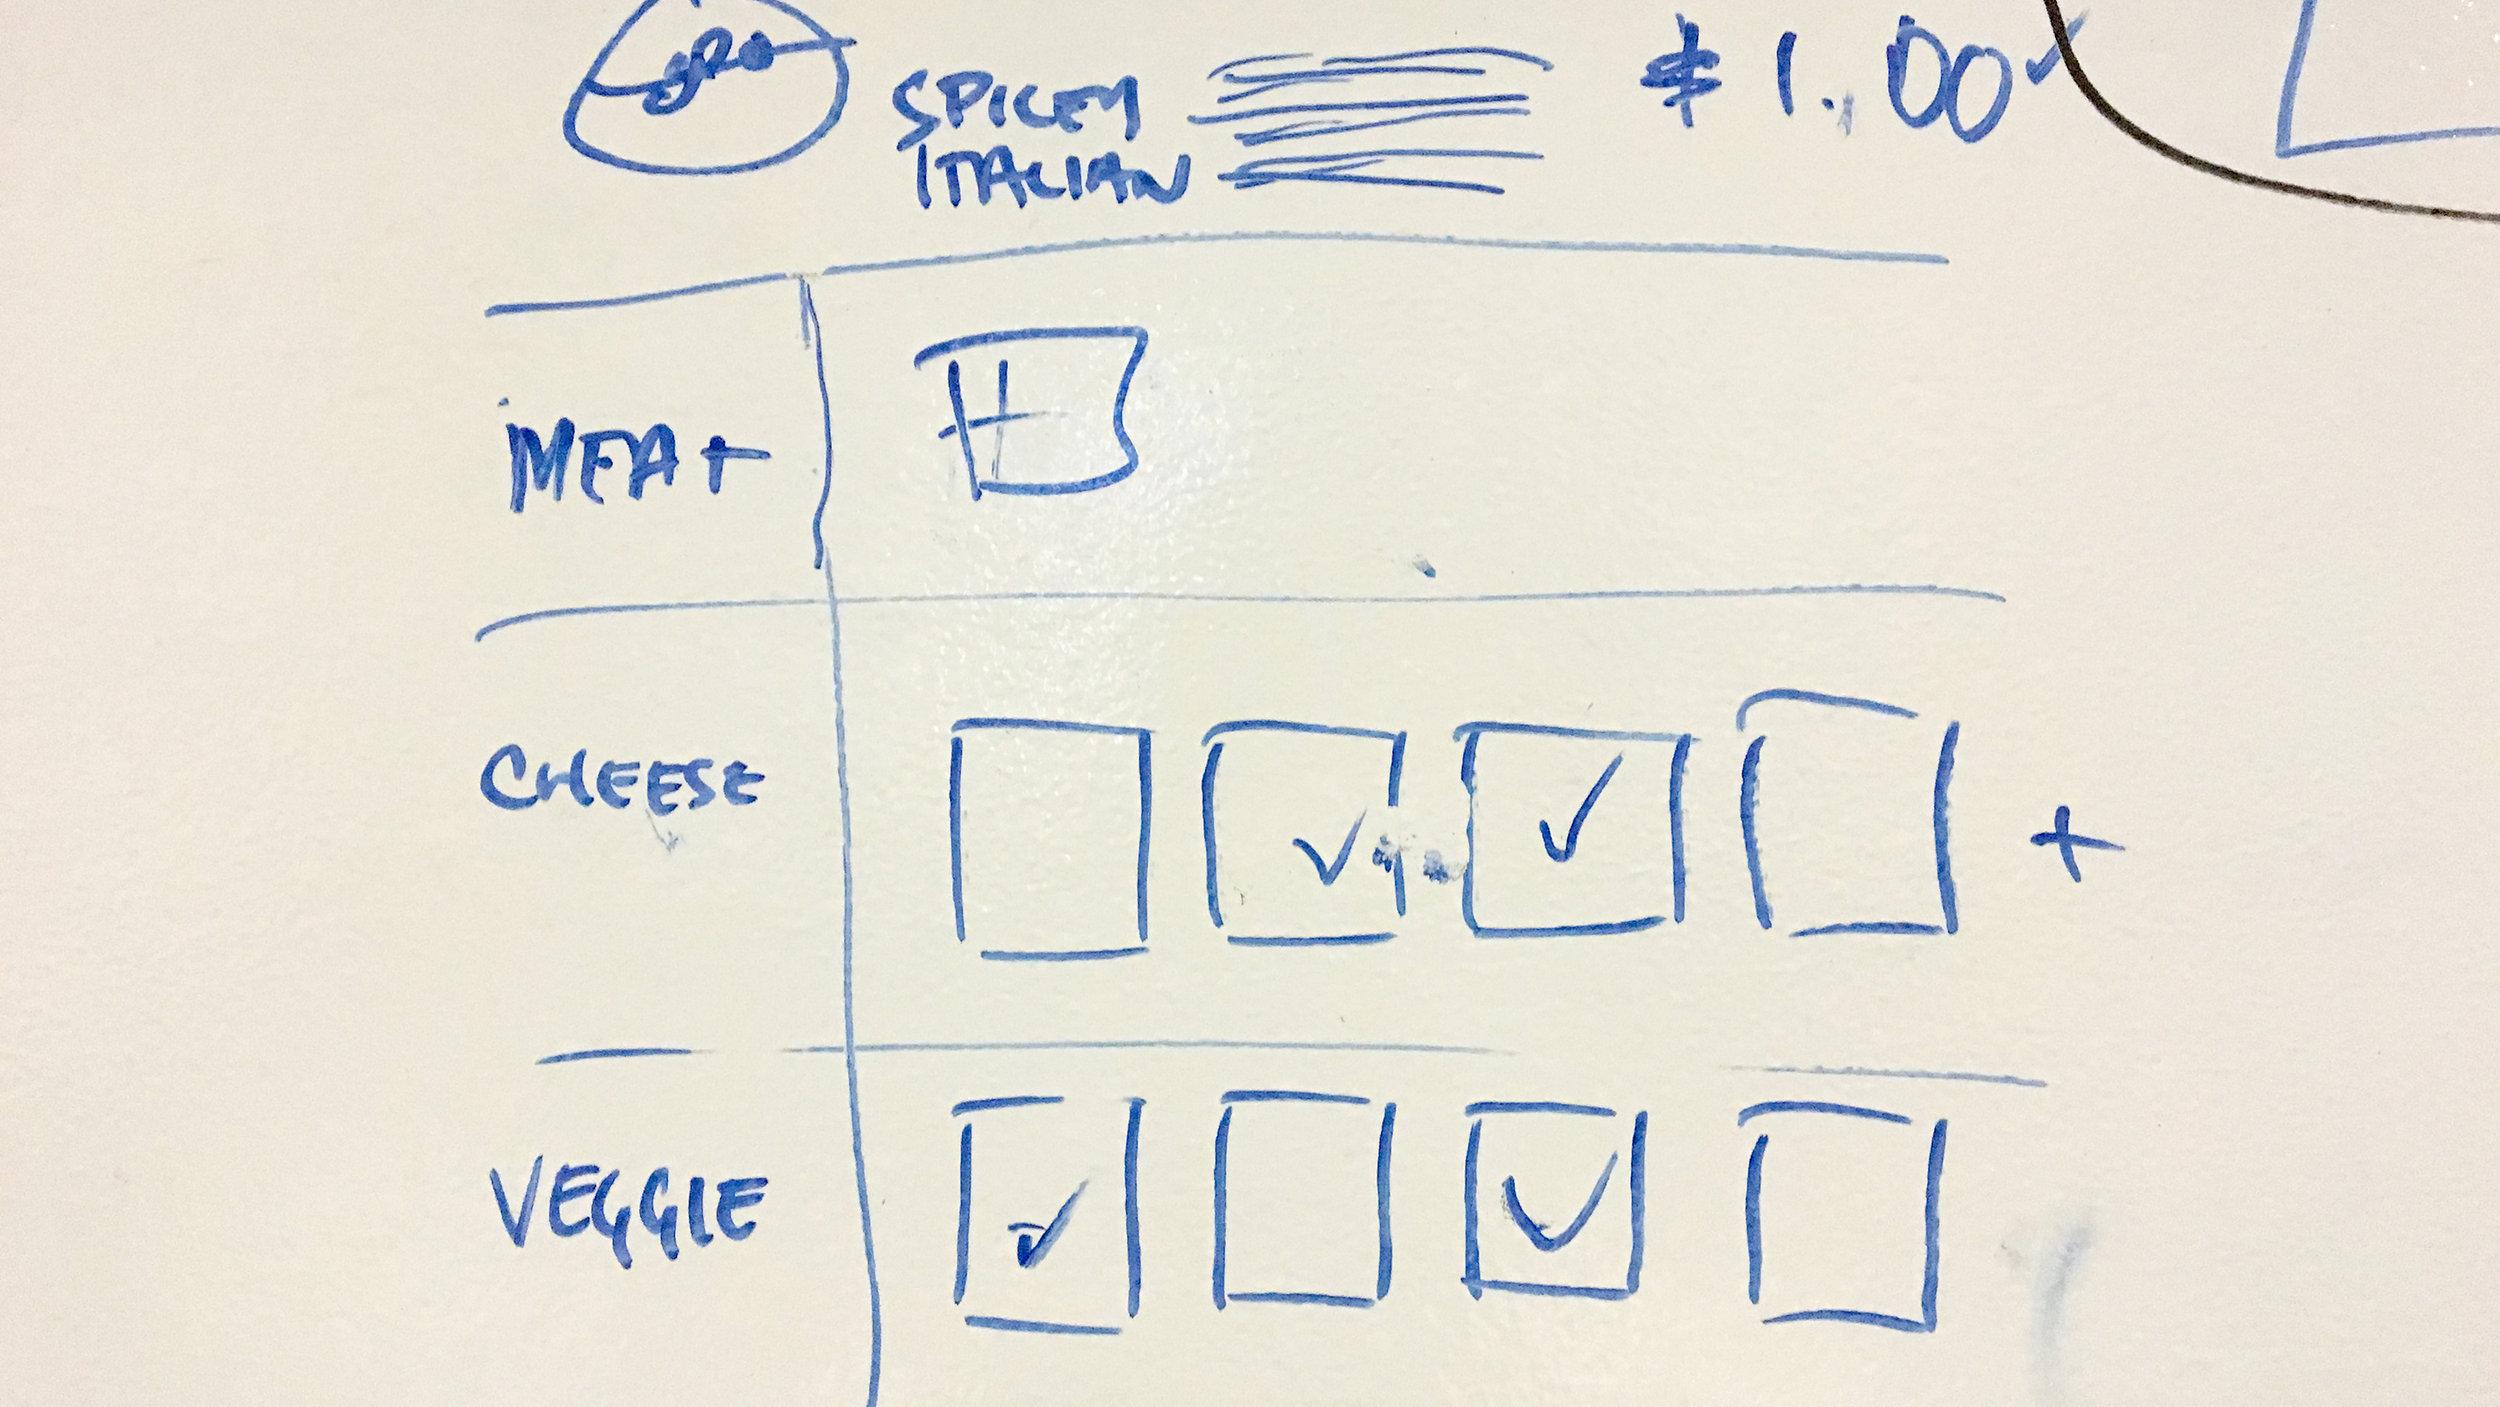 whiteboard sketch 03.jpg